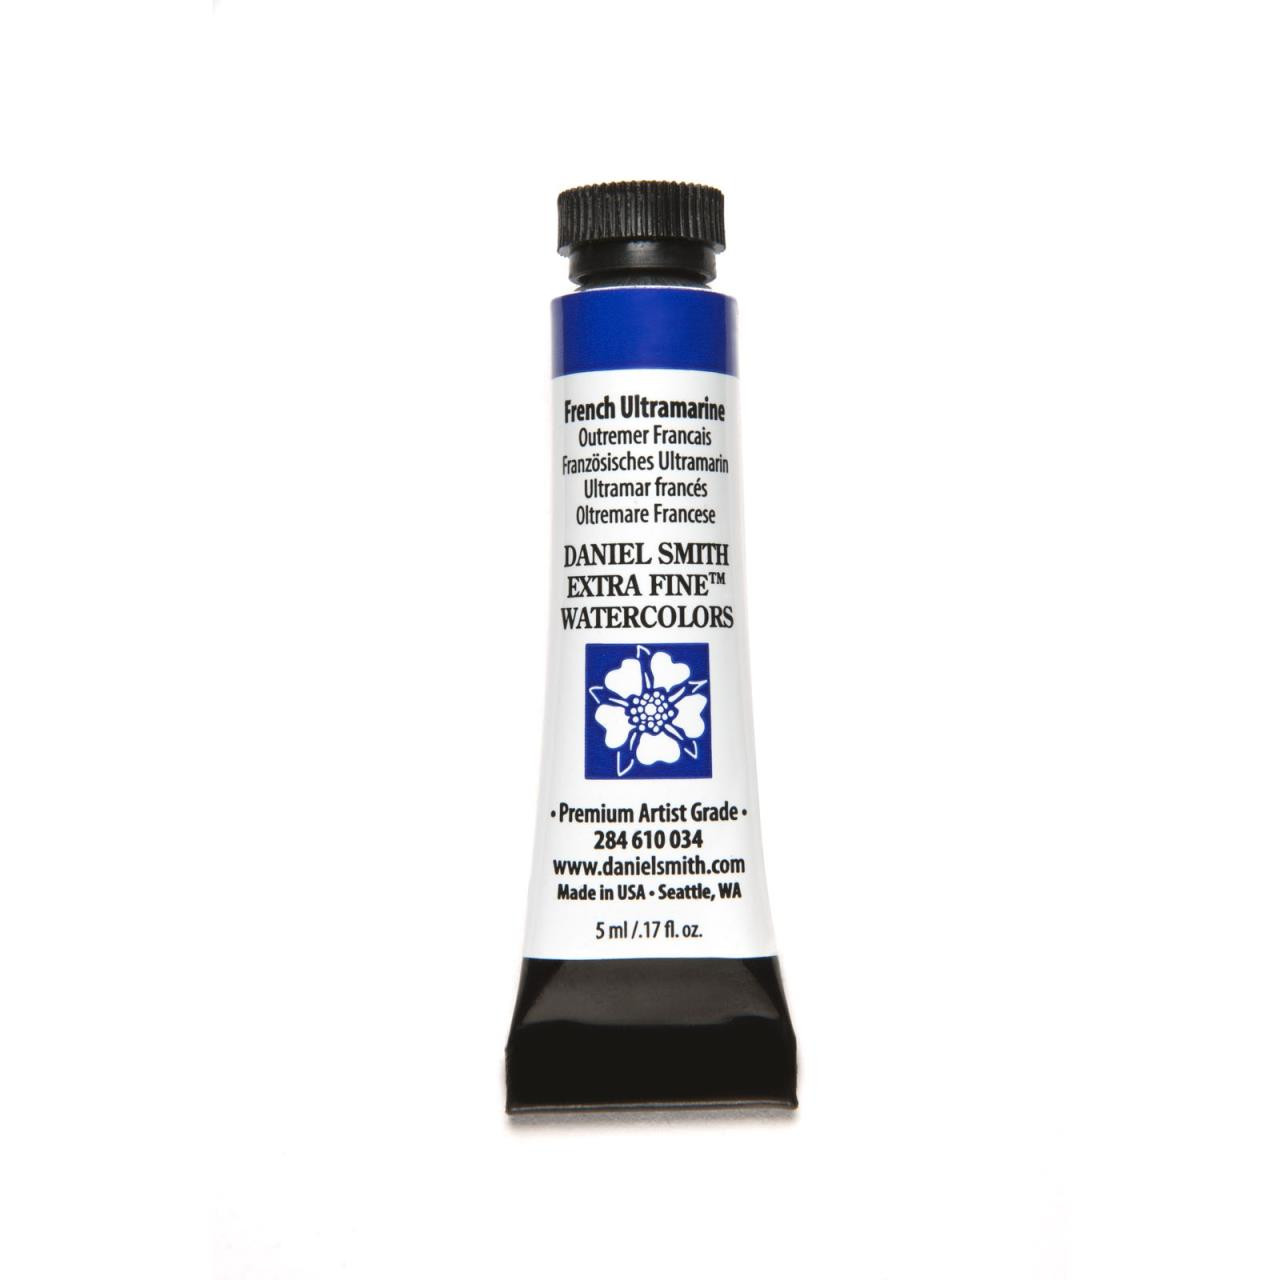 French Ultramarine, DANIEL SMITH Extra Fine Watercolors 5ml Tubes -